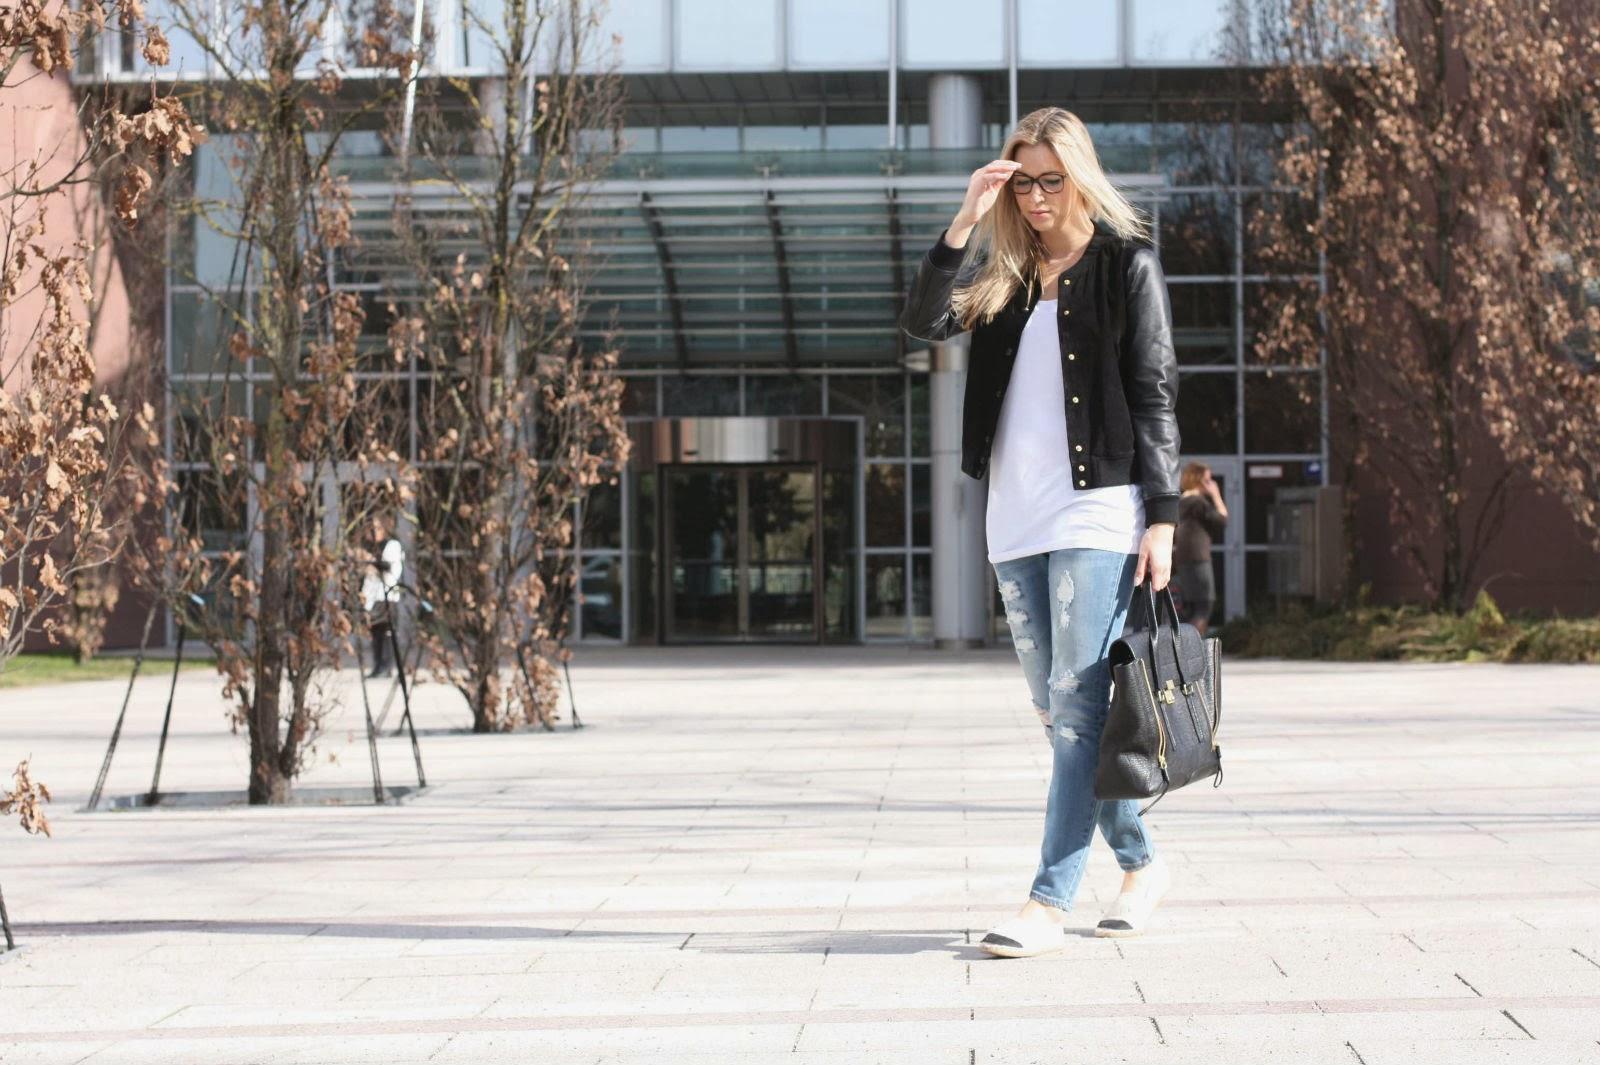 Mode Blog, Fashion Blog, Patrizia Paul, College Jacke Mango, Chanel Brille, Blonde Strähnchen, The Paste Blog